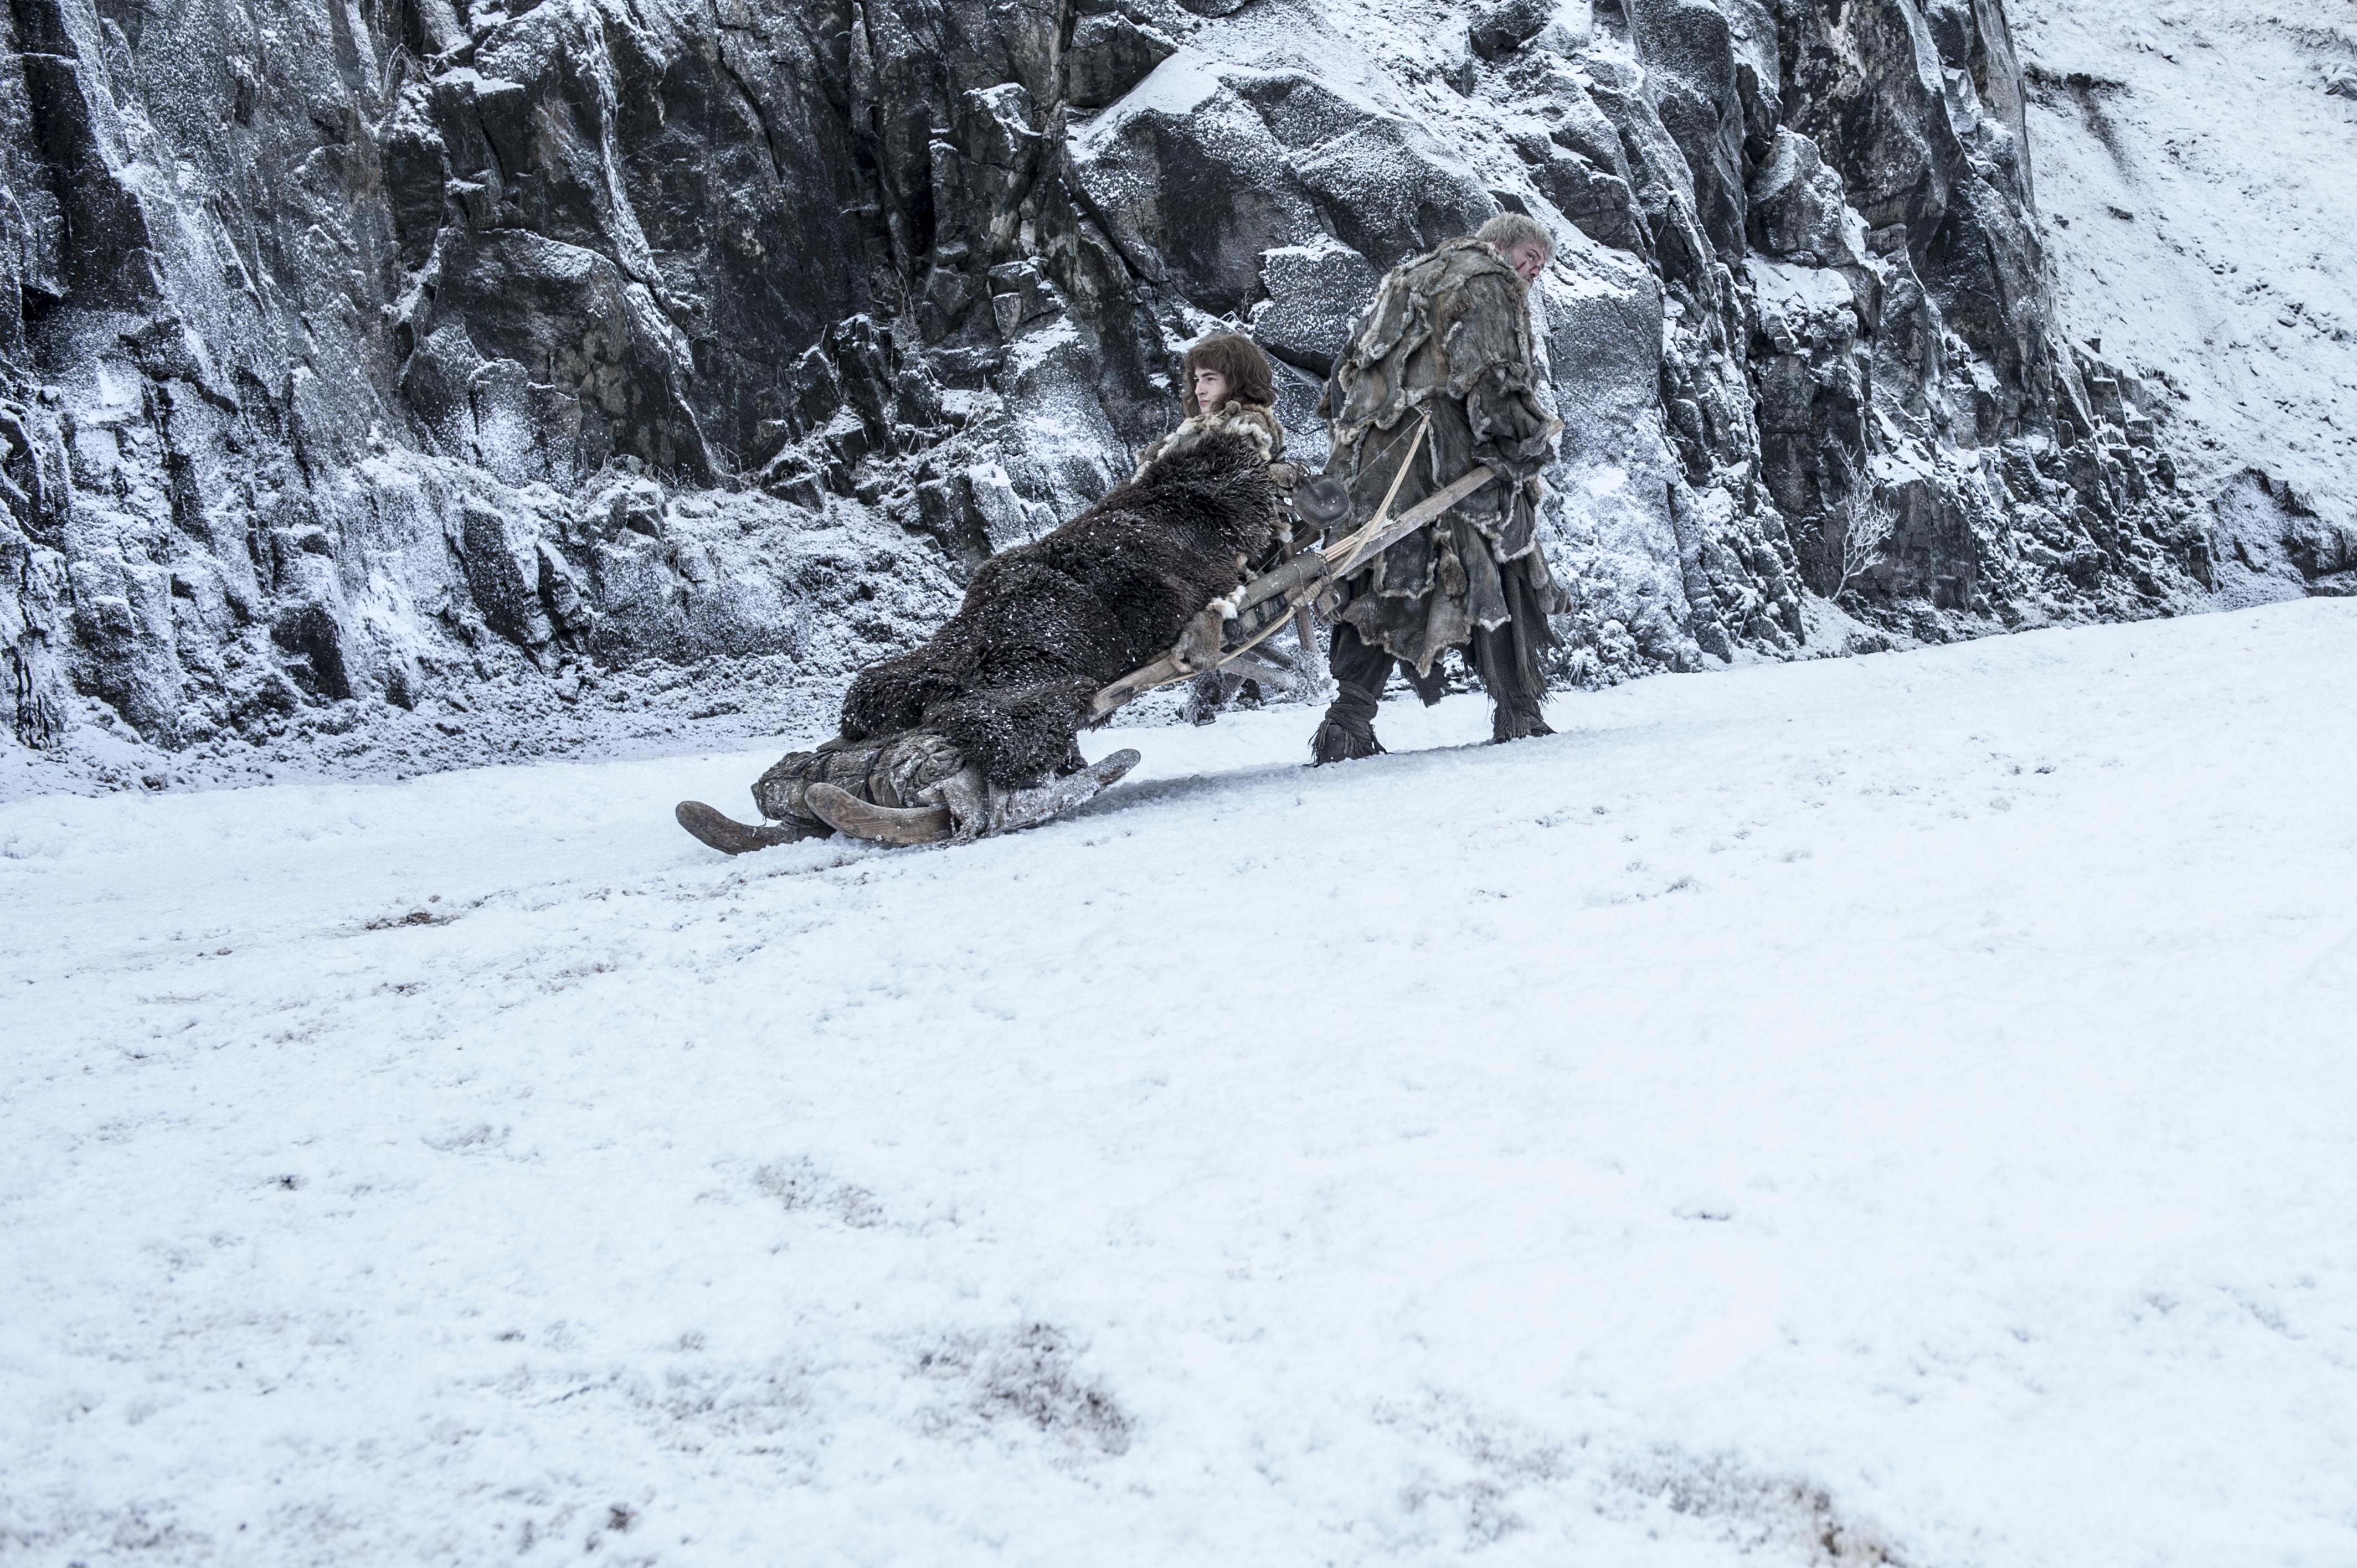 AT&T Entertainment Presents: Bran Stark, the Three-Eyed Raven